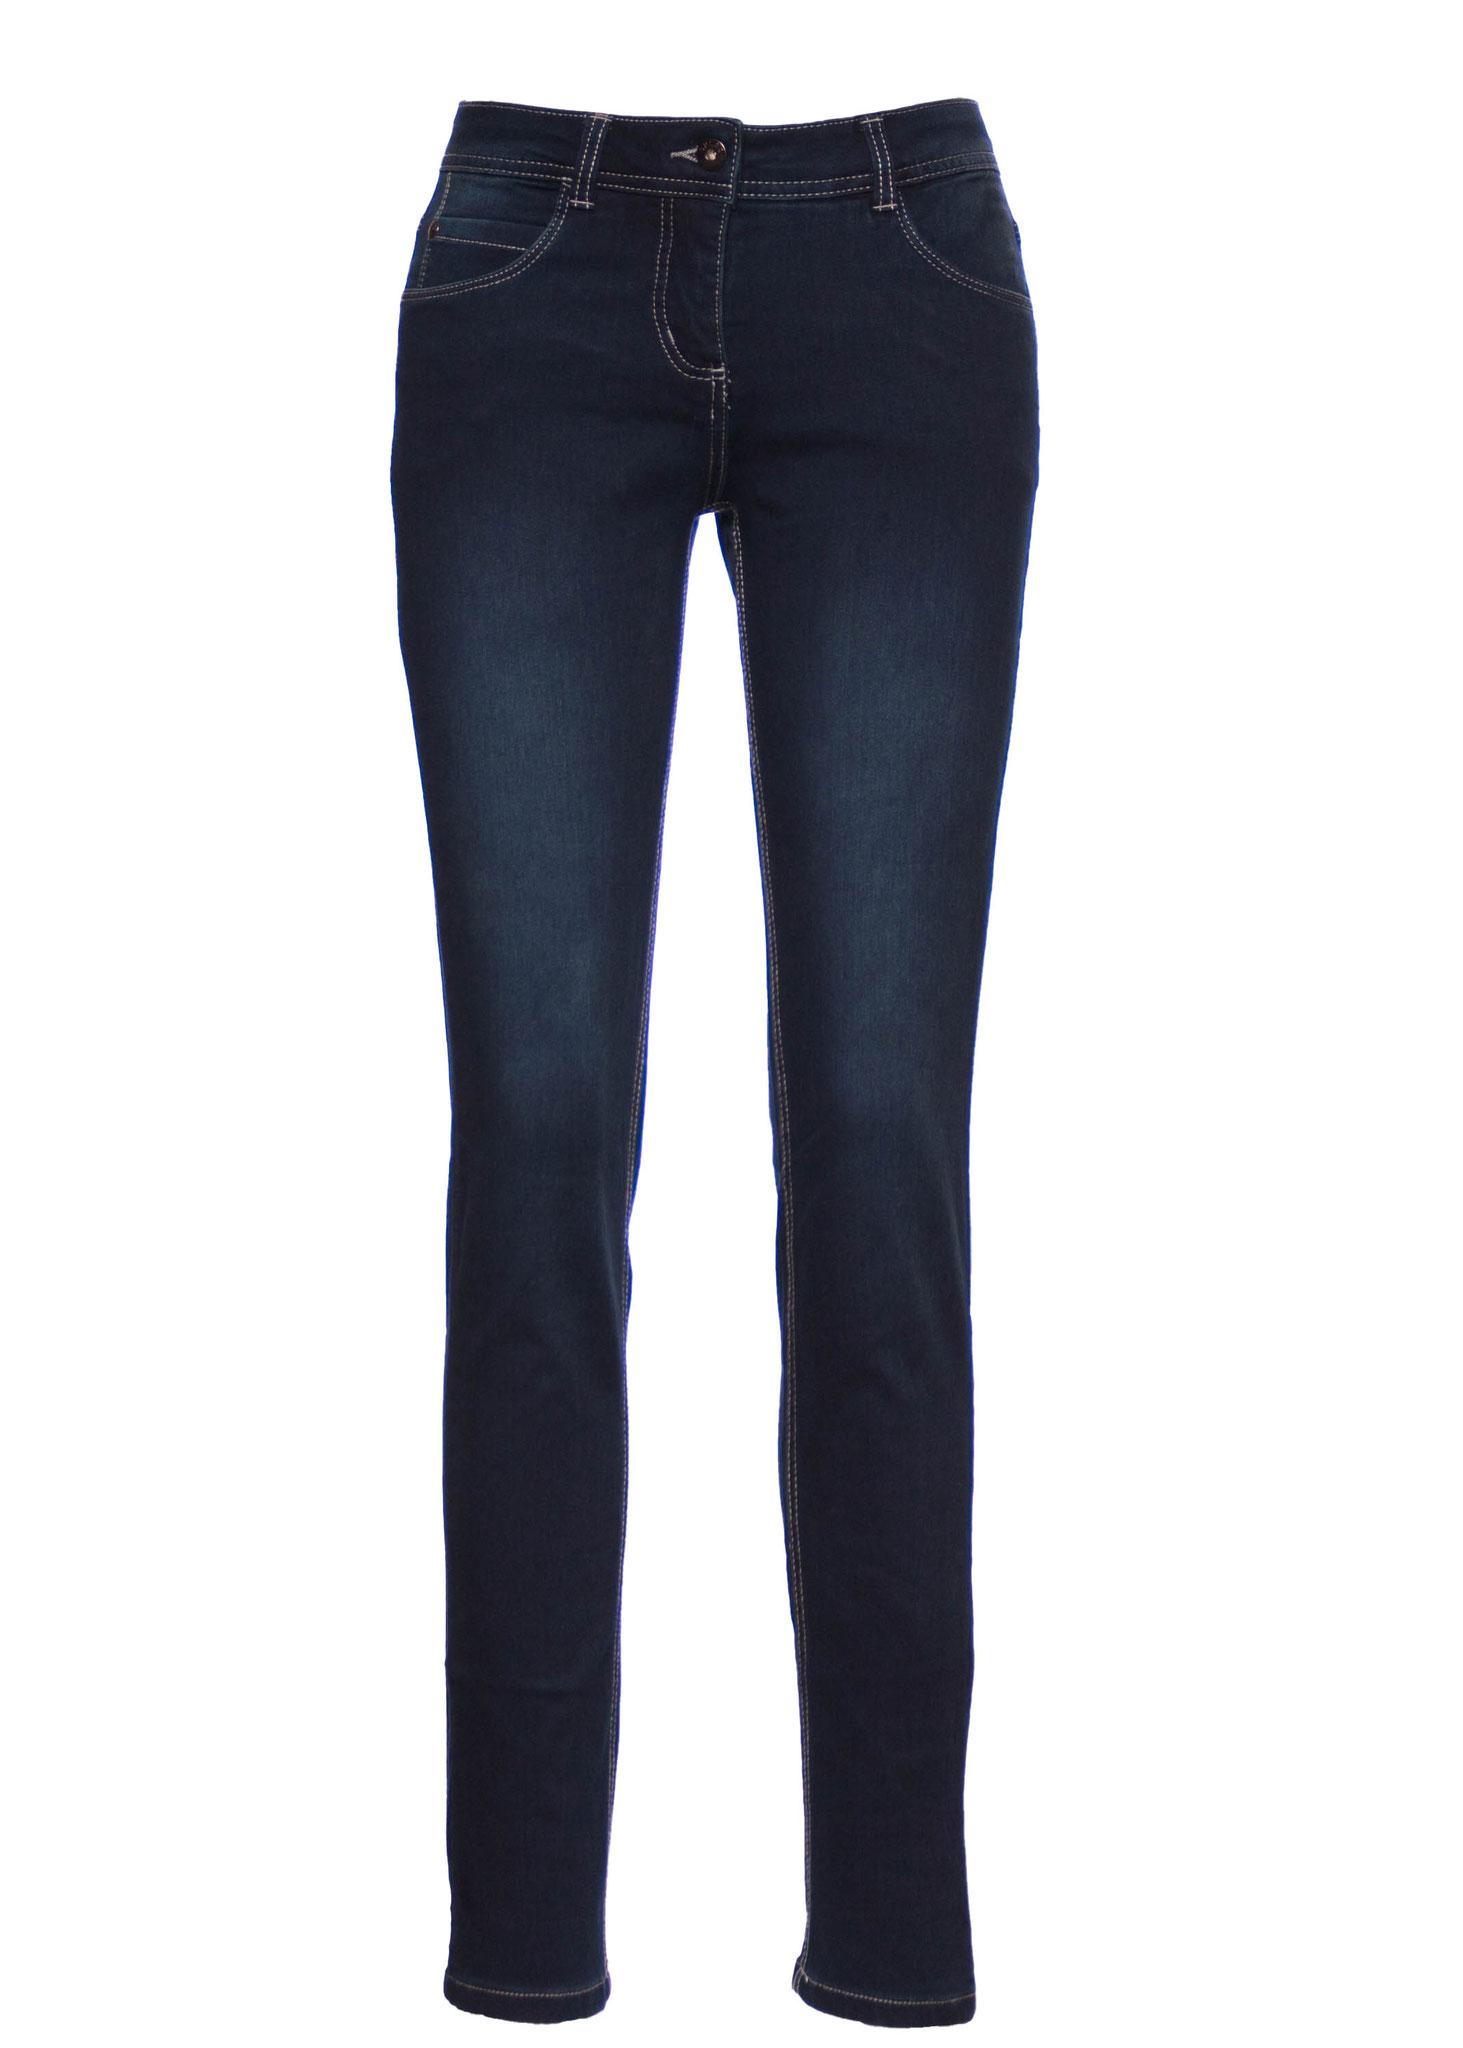 Basic Jeans Dark Used 39,99€